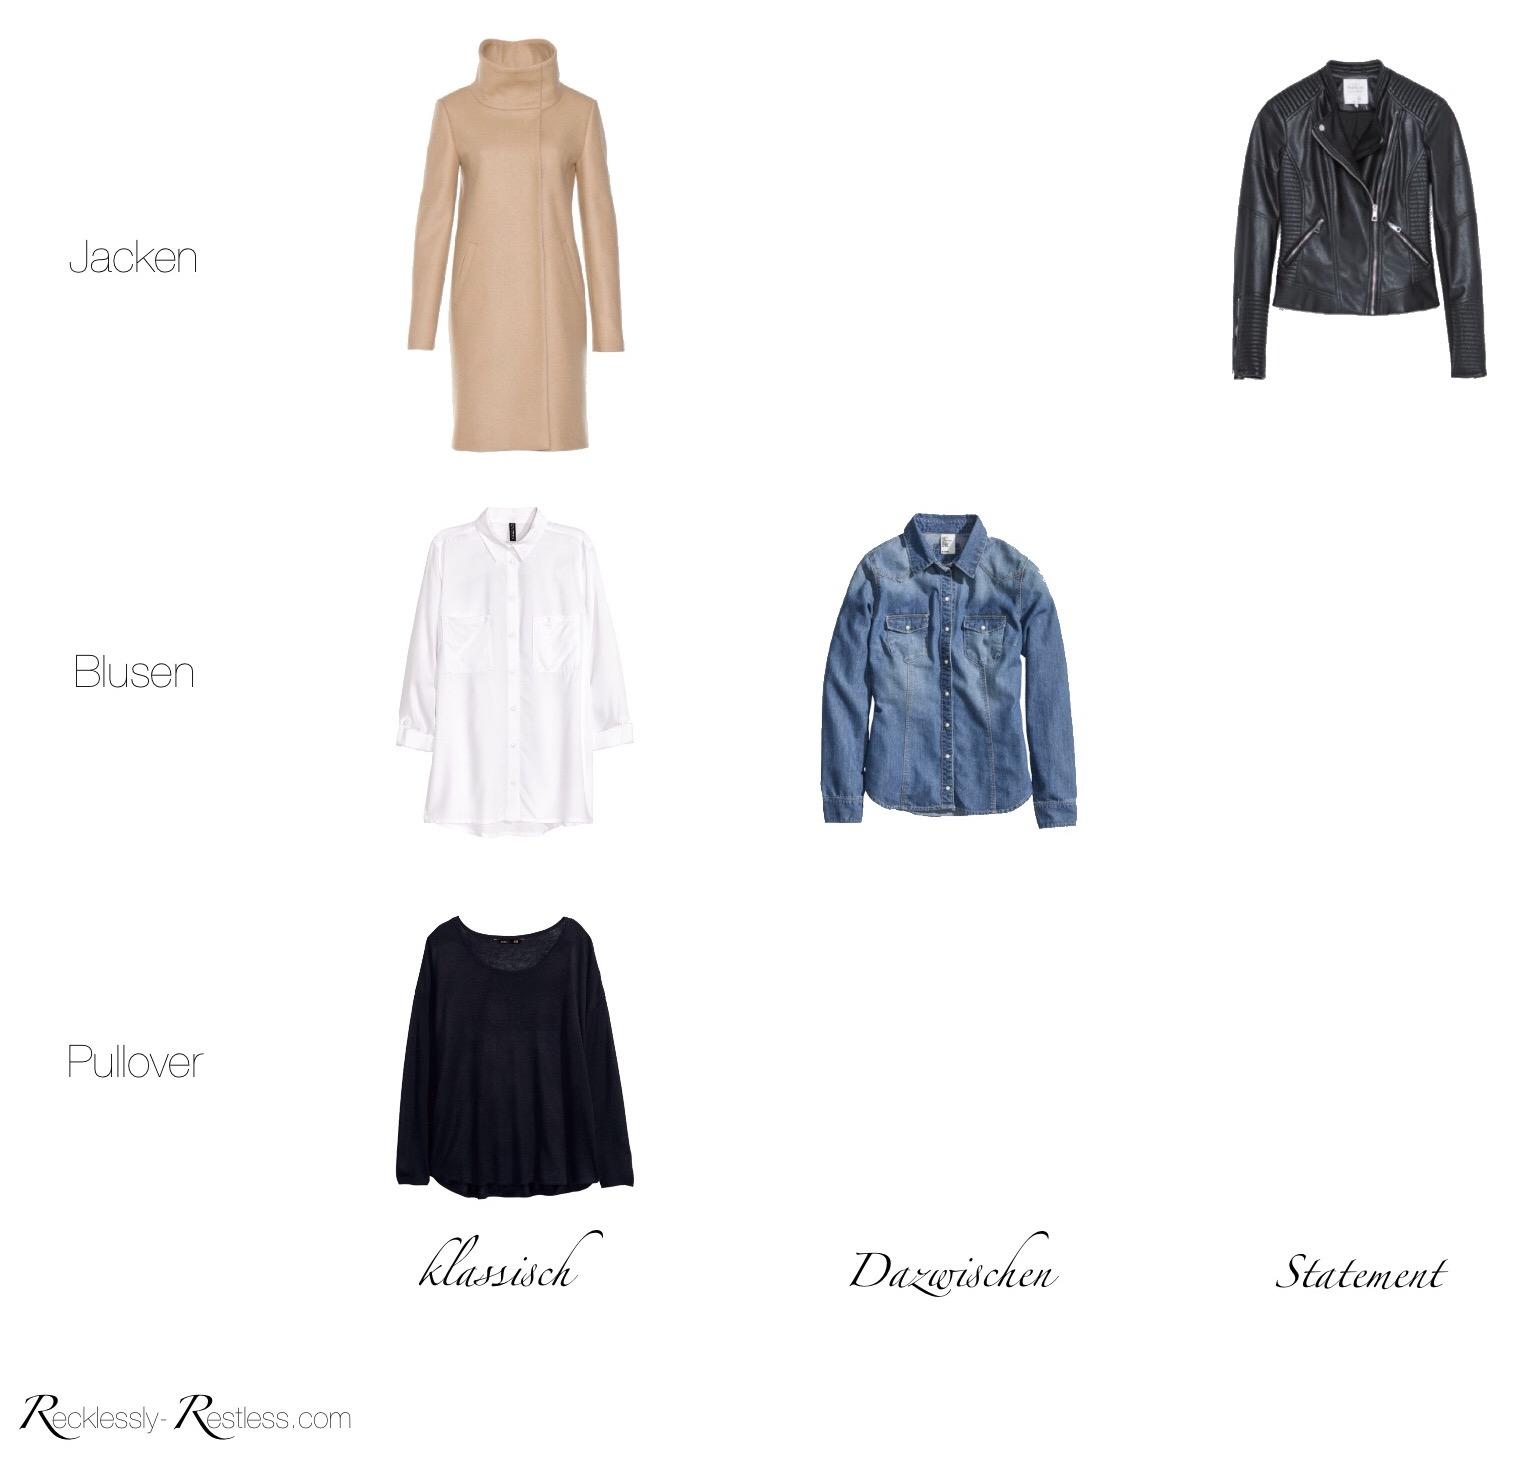 klamotten-fuer-shopping-liste-finden